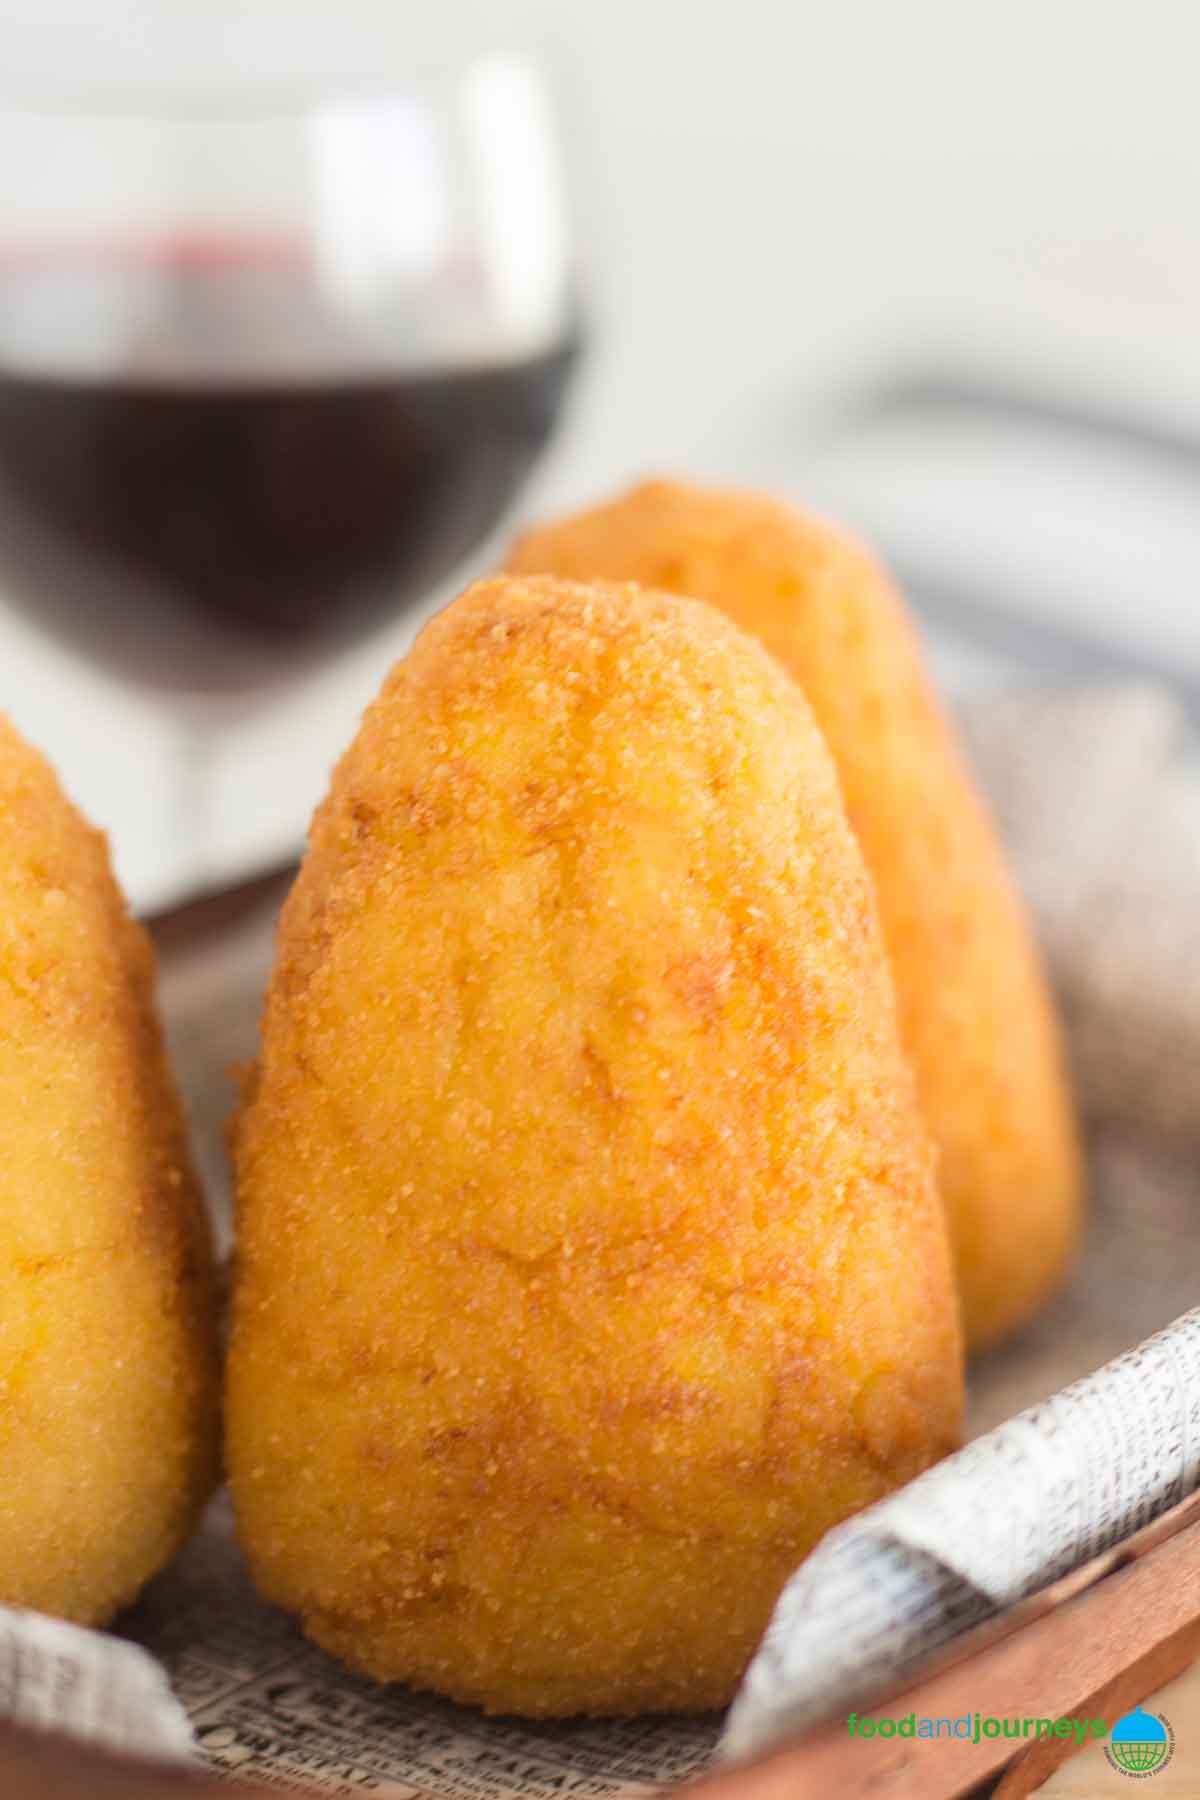 Image of Arancini, as part of Best Italian Street Food Recipes.